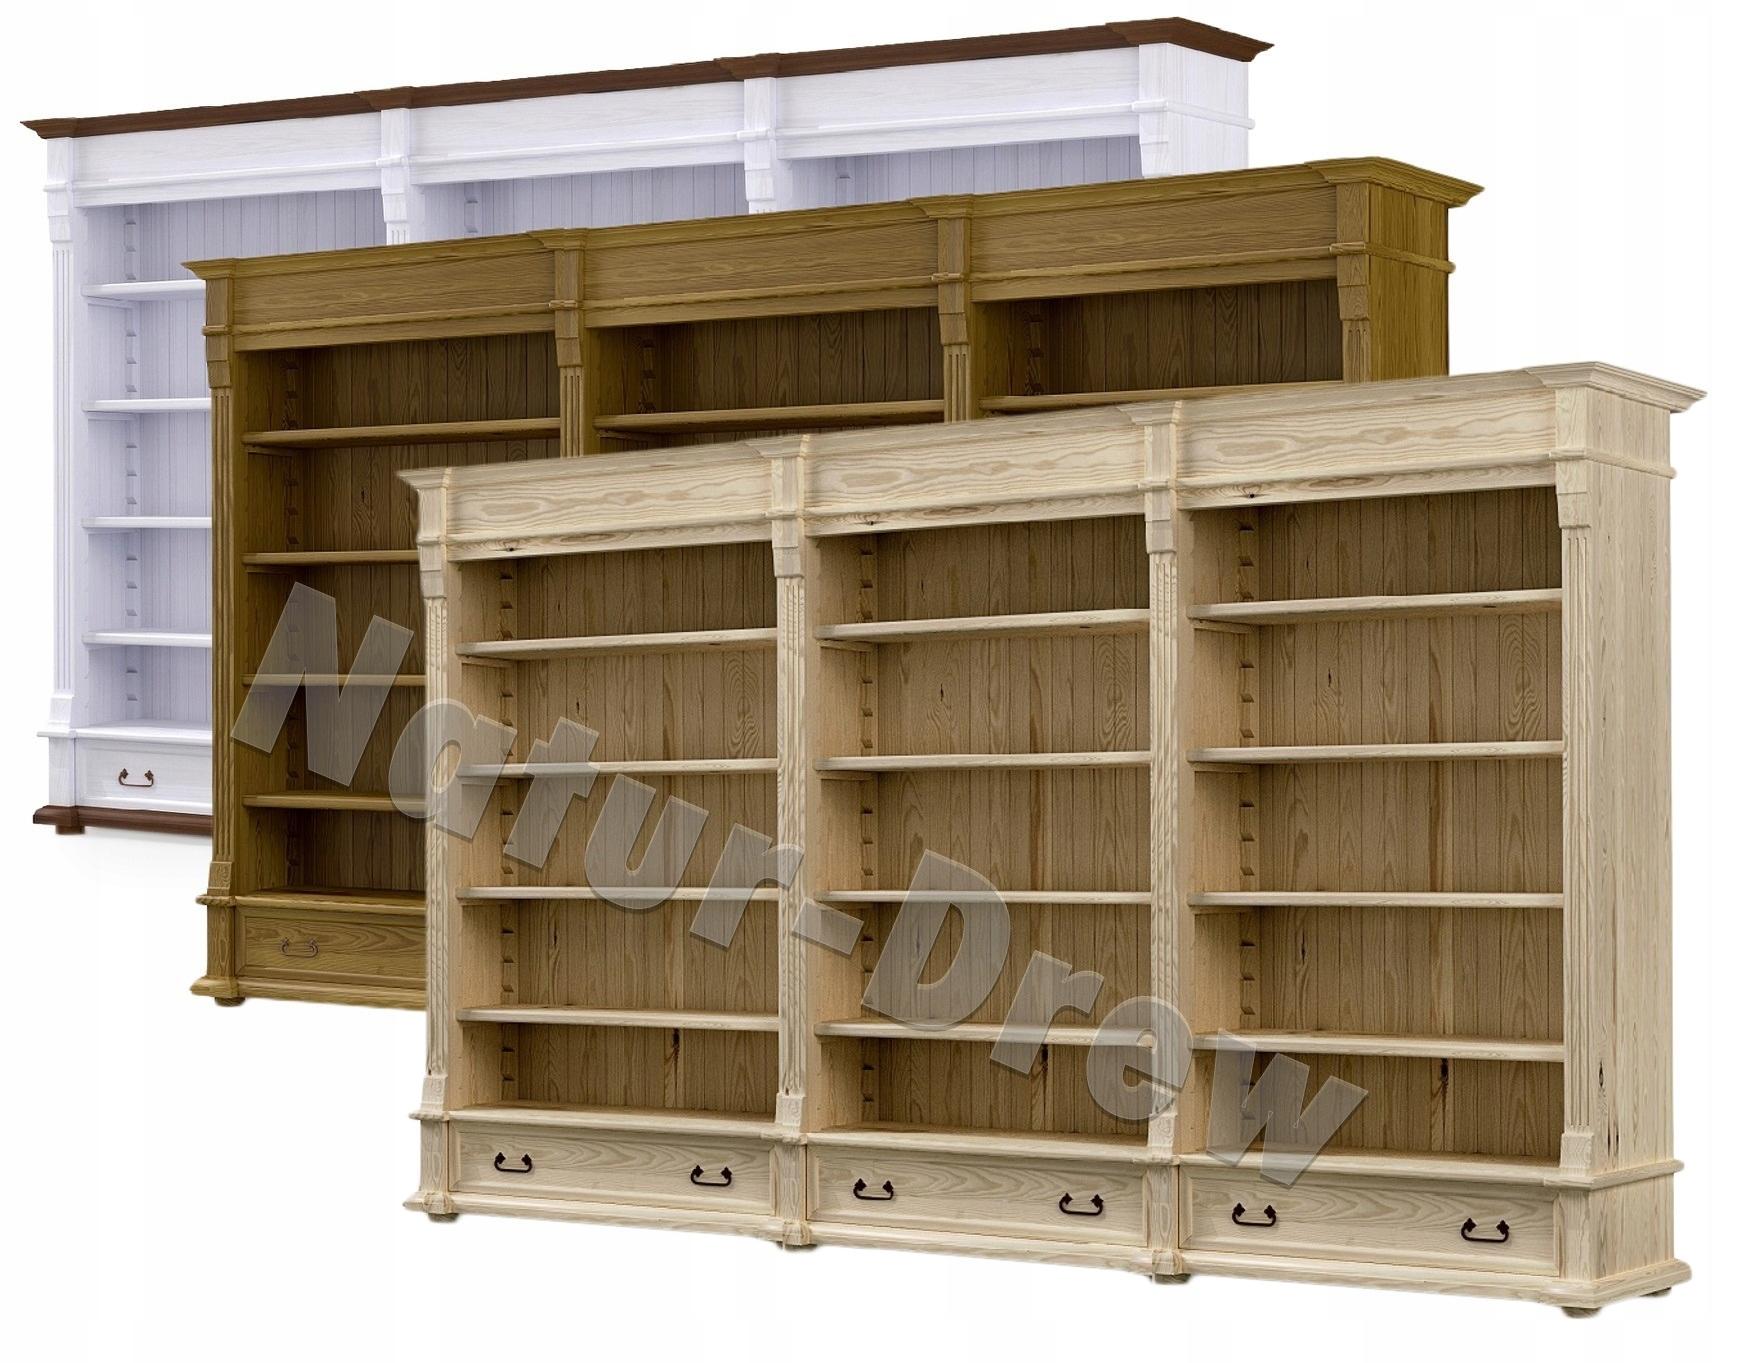 Drevená knižnica, polica, knižnica RETRO